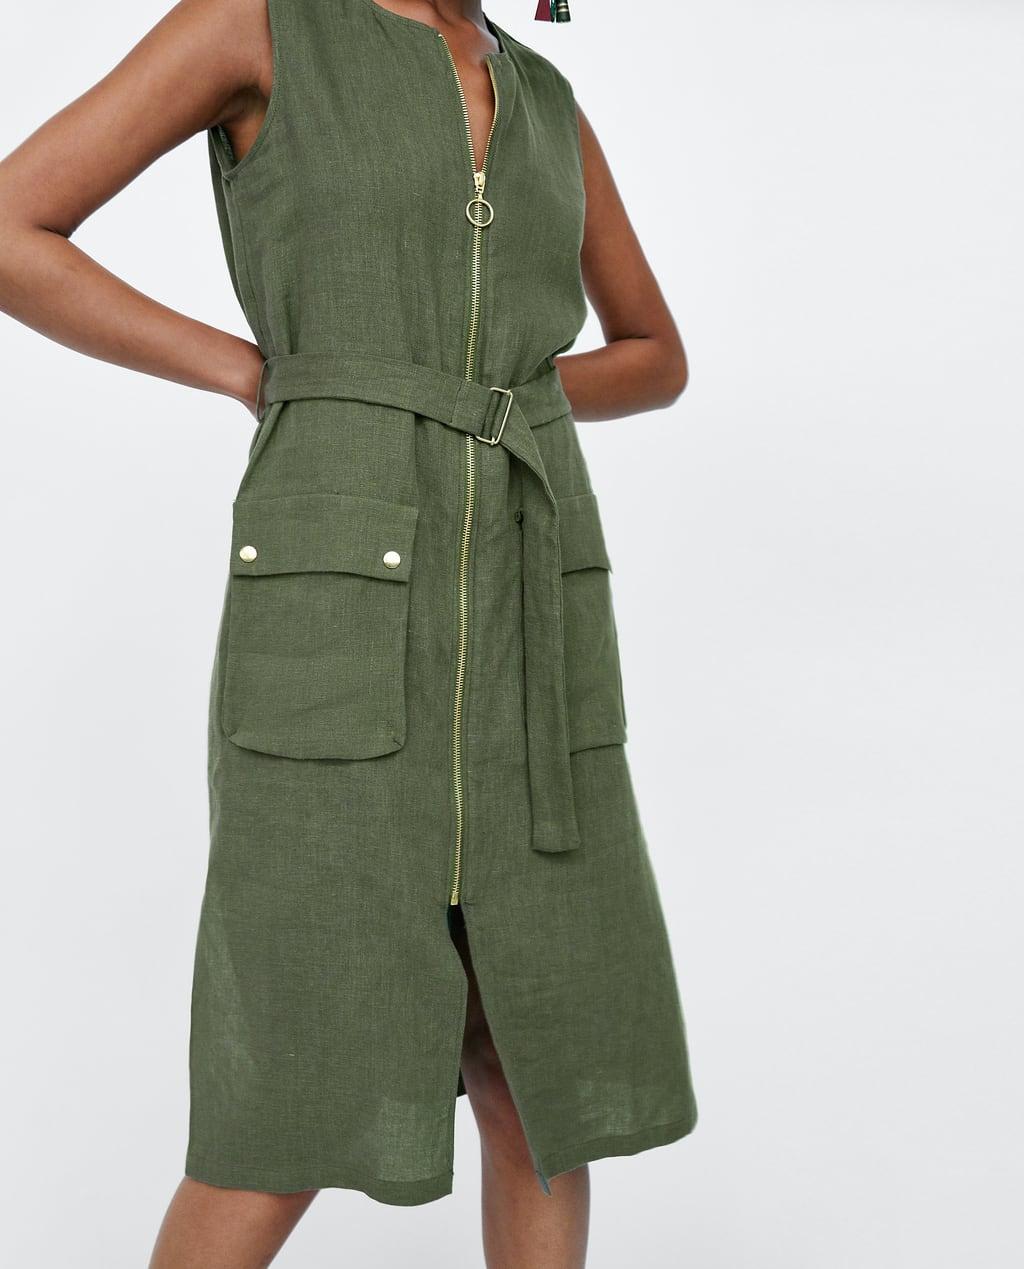 5e0193e6 Zara Linen Dress With Pockets